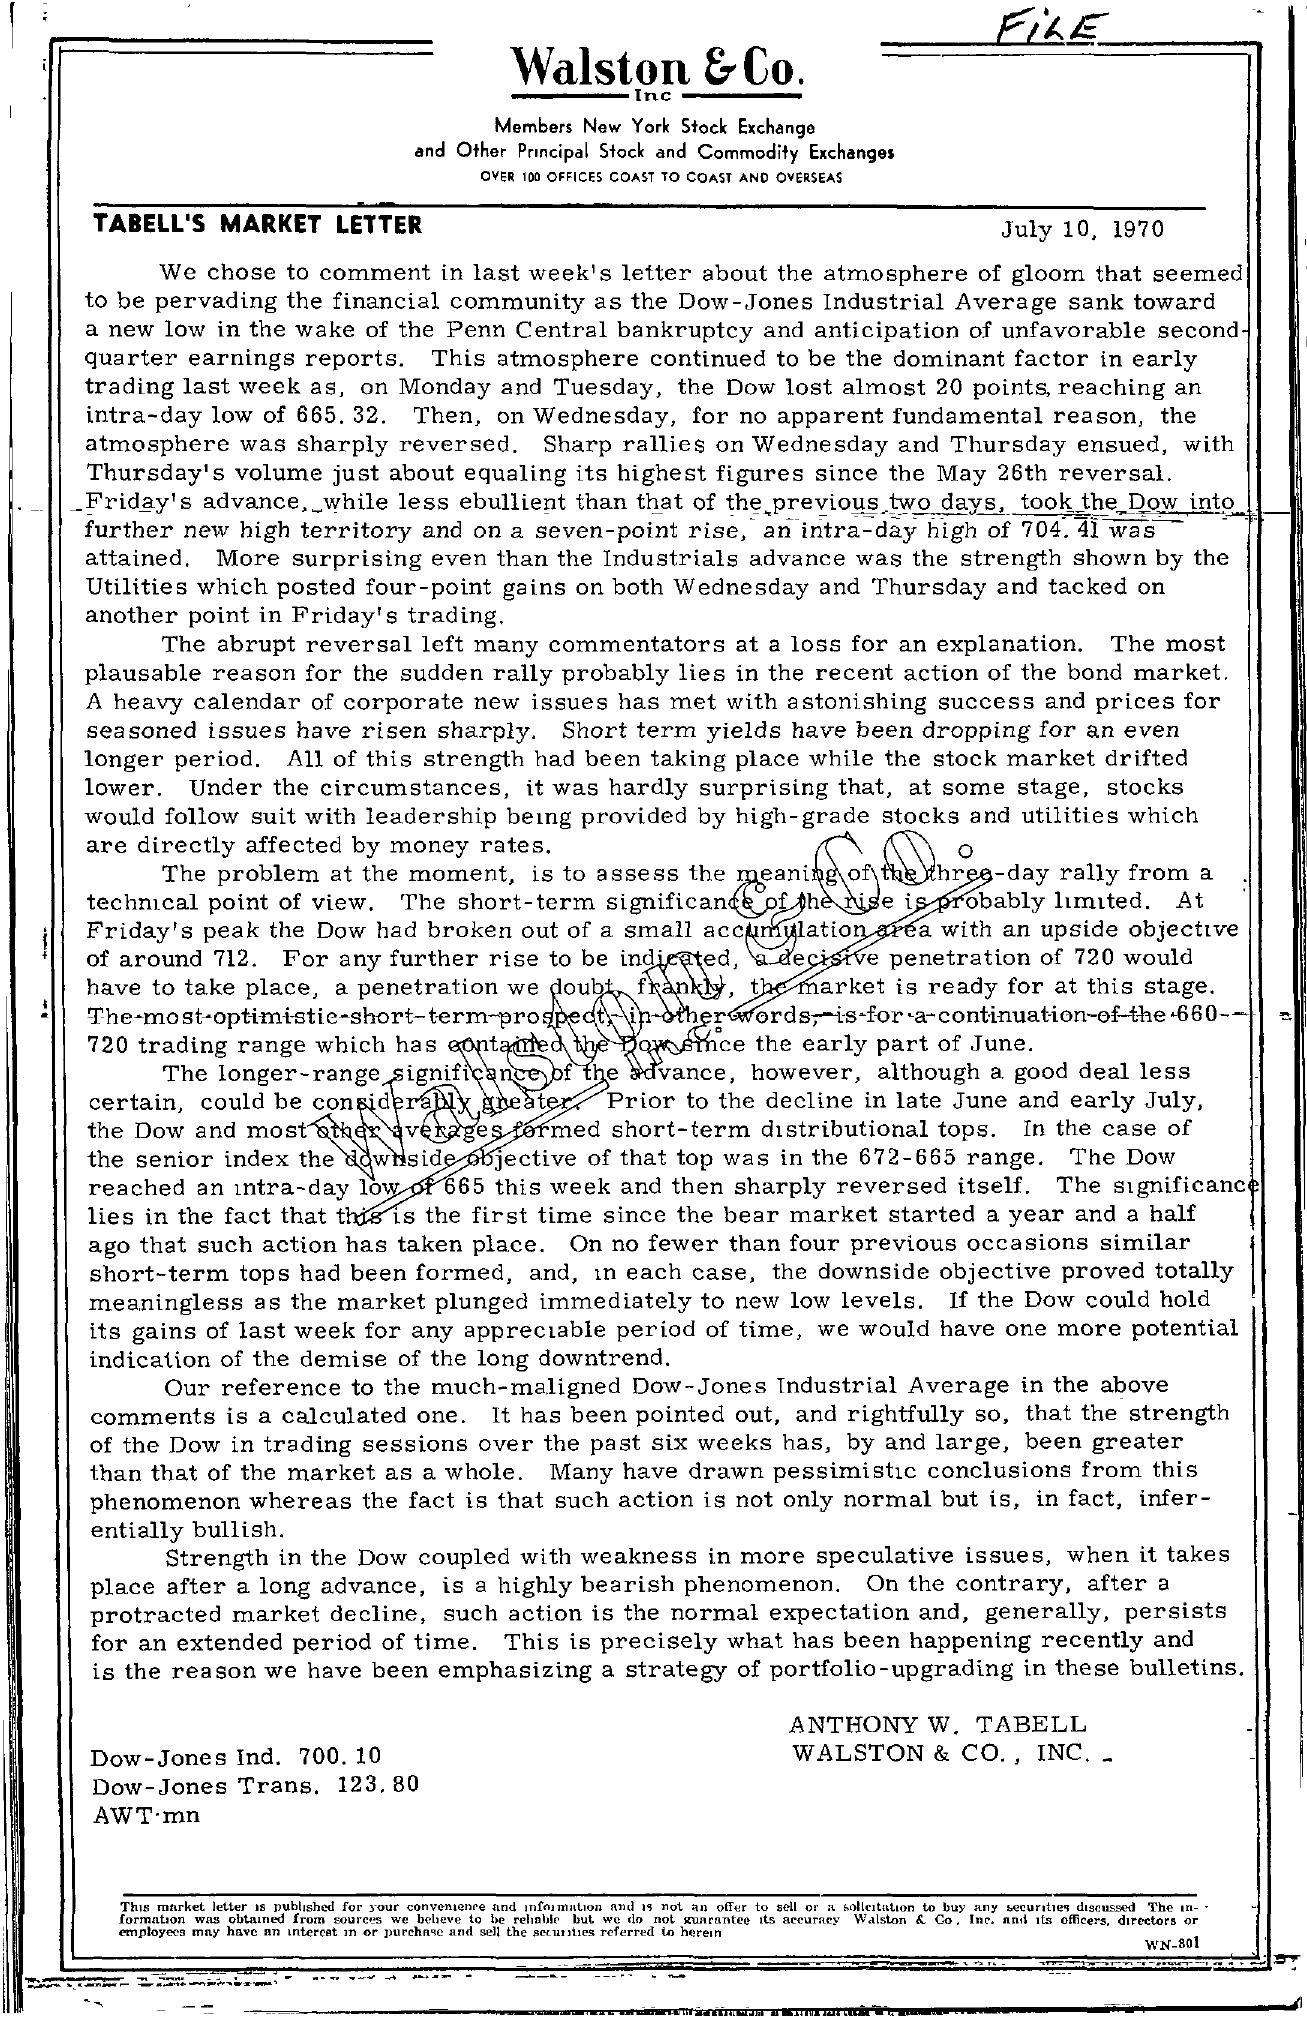 Tabell's Market Letter - July 10, 1970